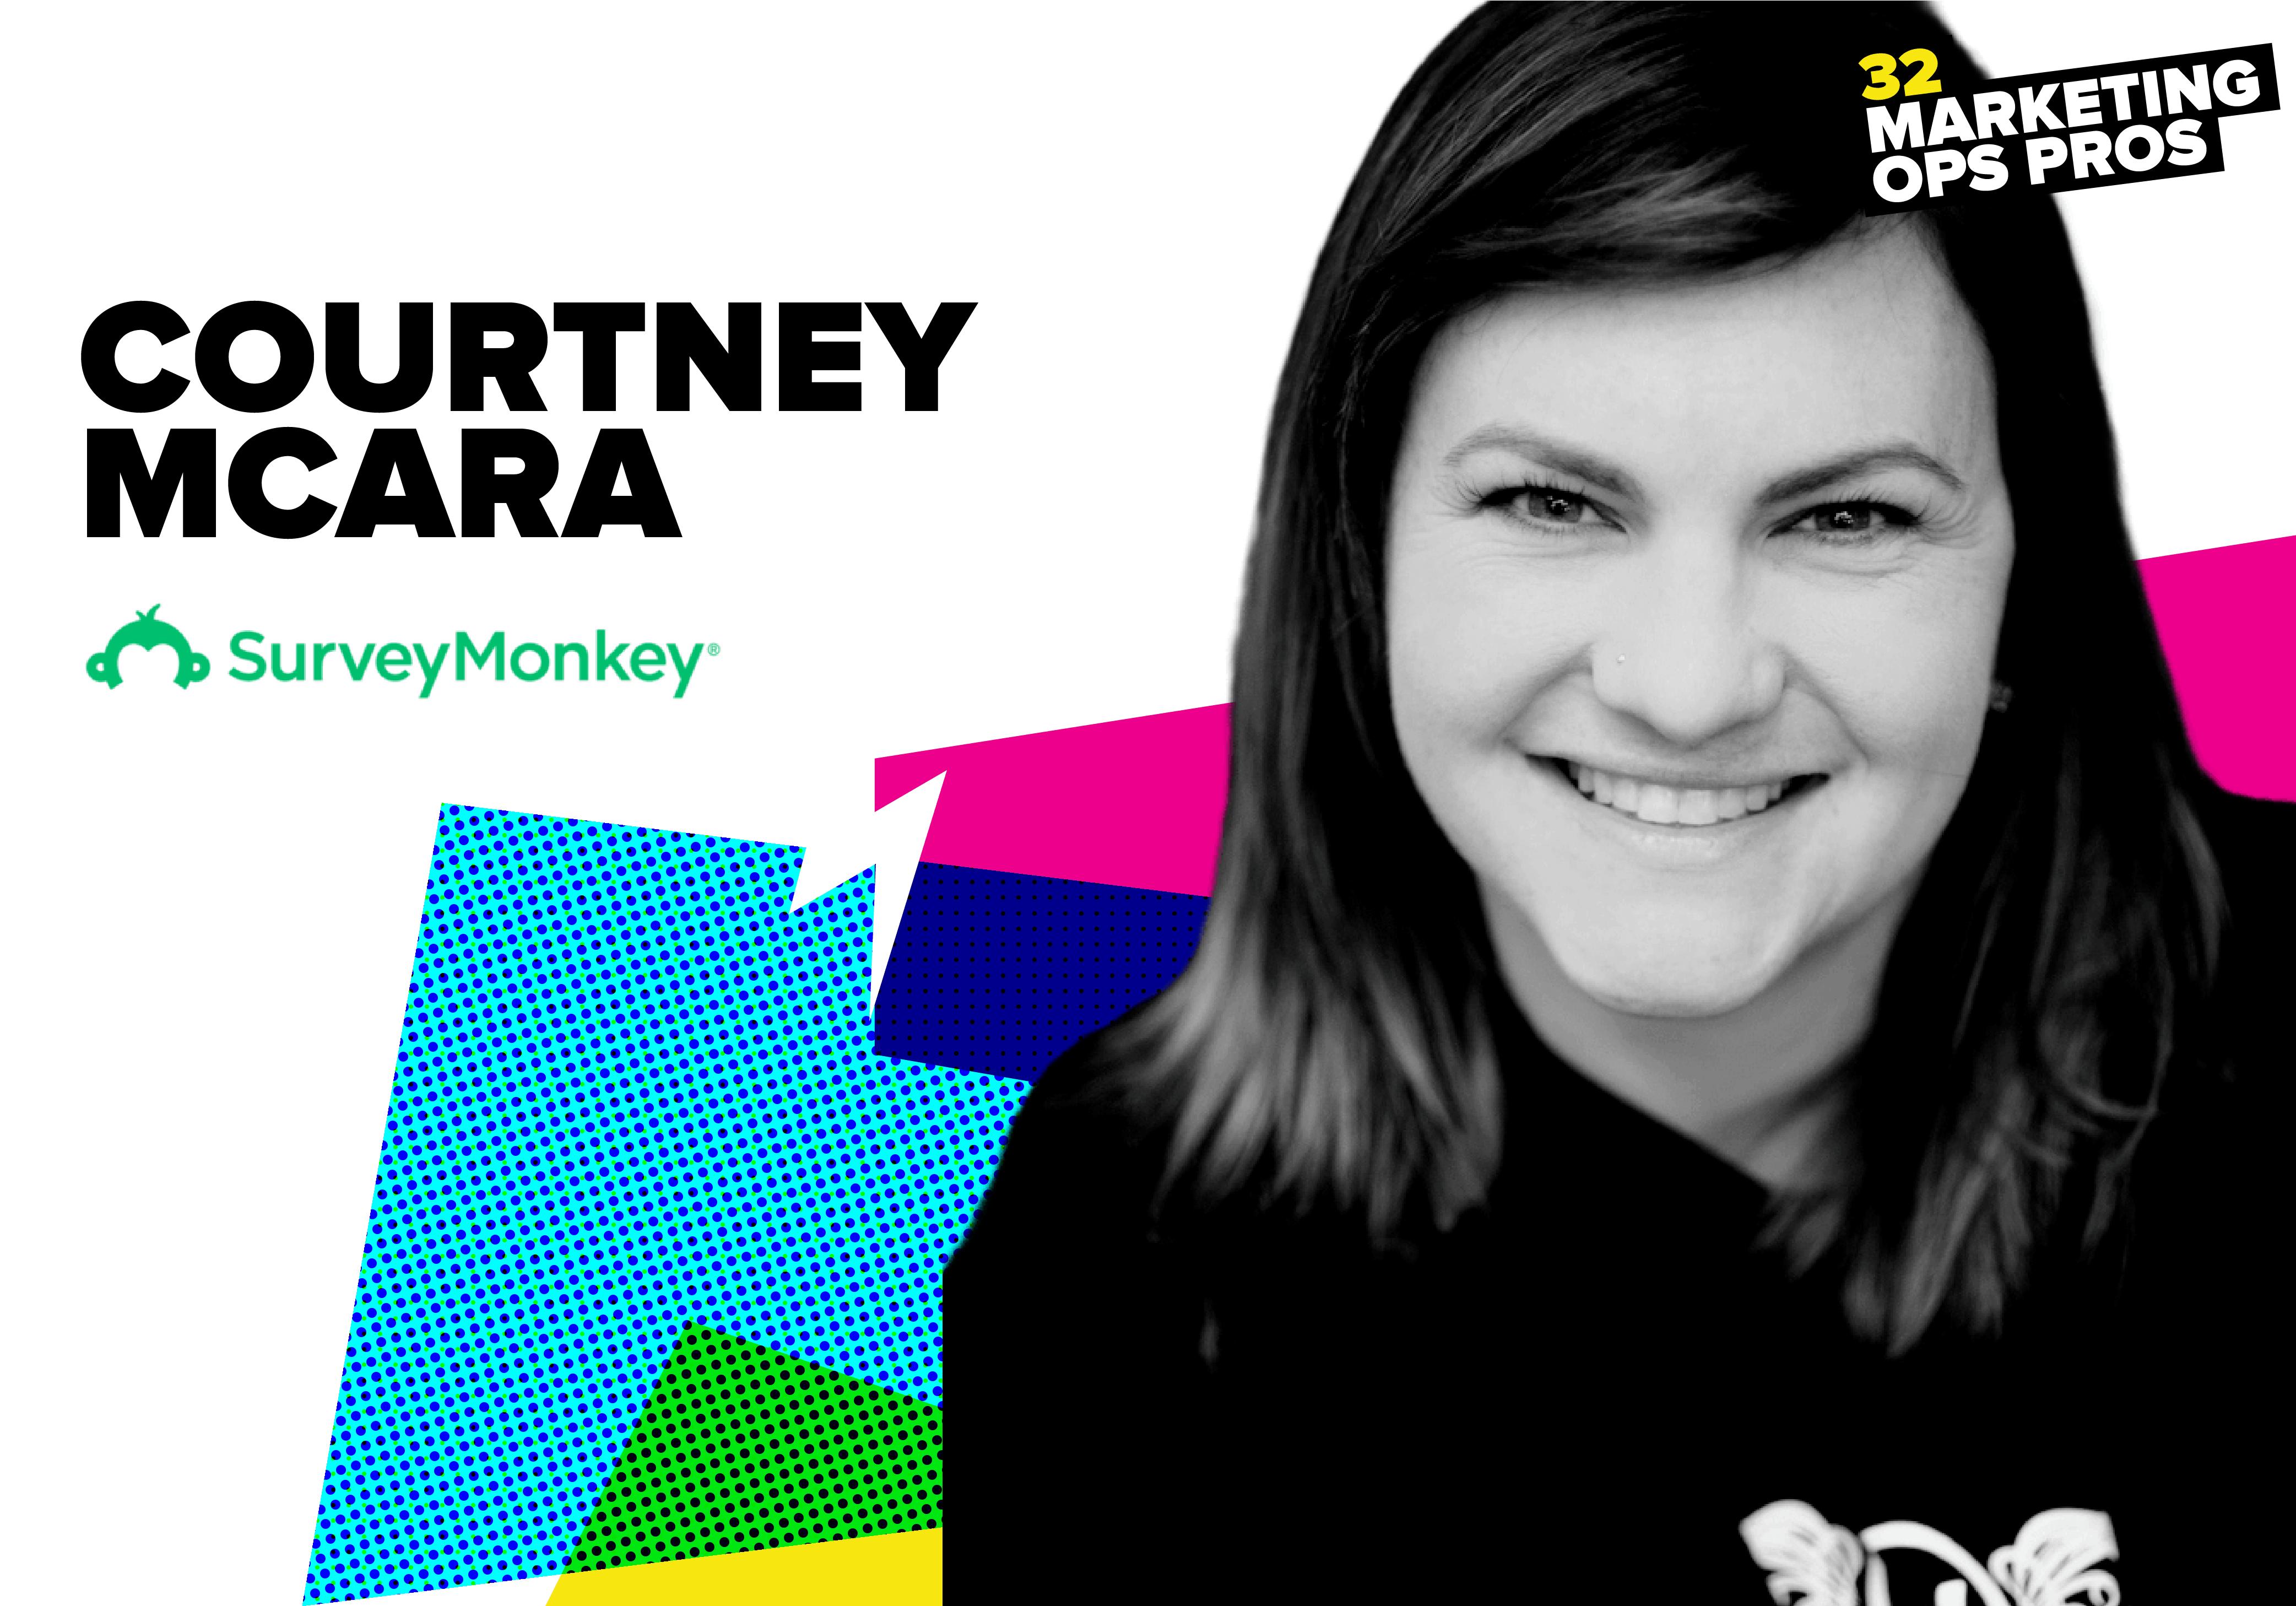 Courtney McAra, SurveyMonkey